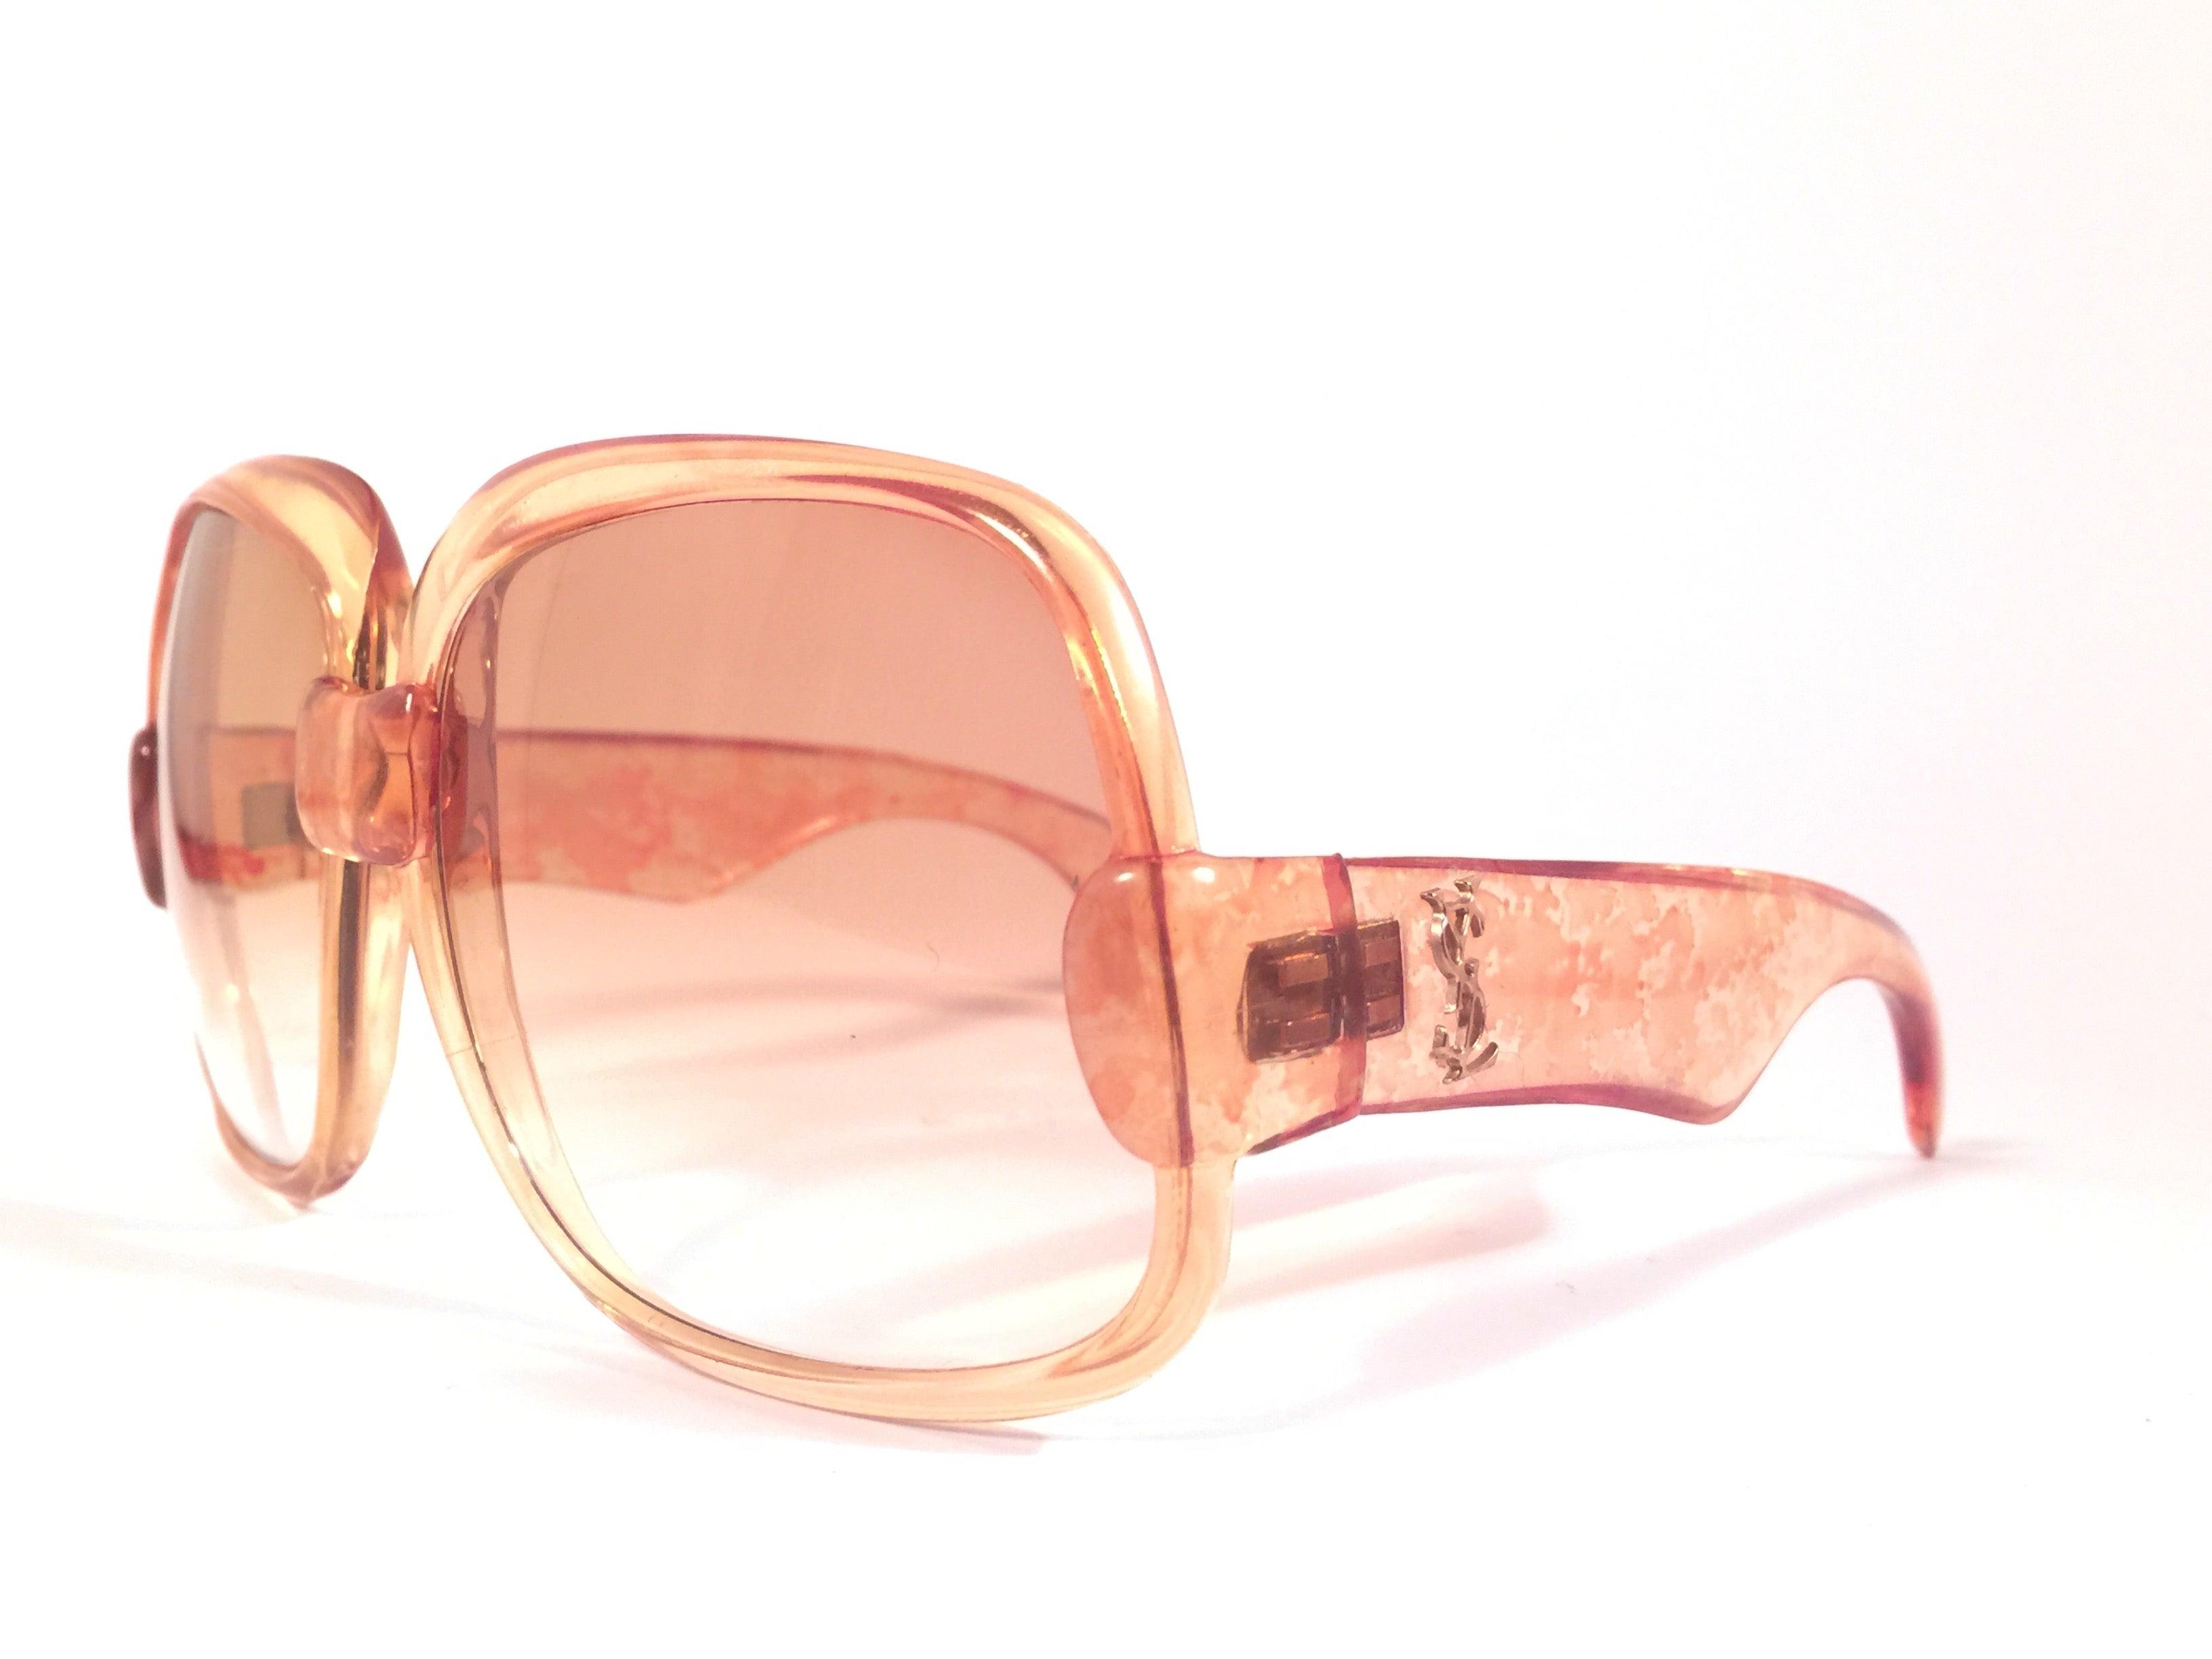 61e5f2789b0 New Vintage Yves Saint Laurent YSL 545 Translucent Orange 1970 France  Sunglasses at 1stdibs